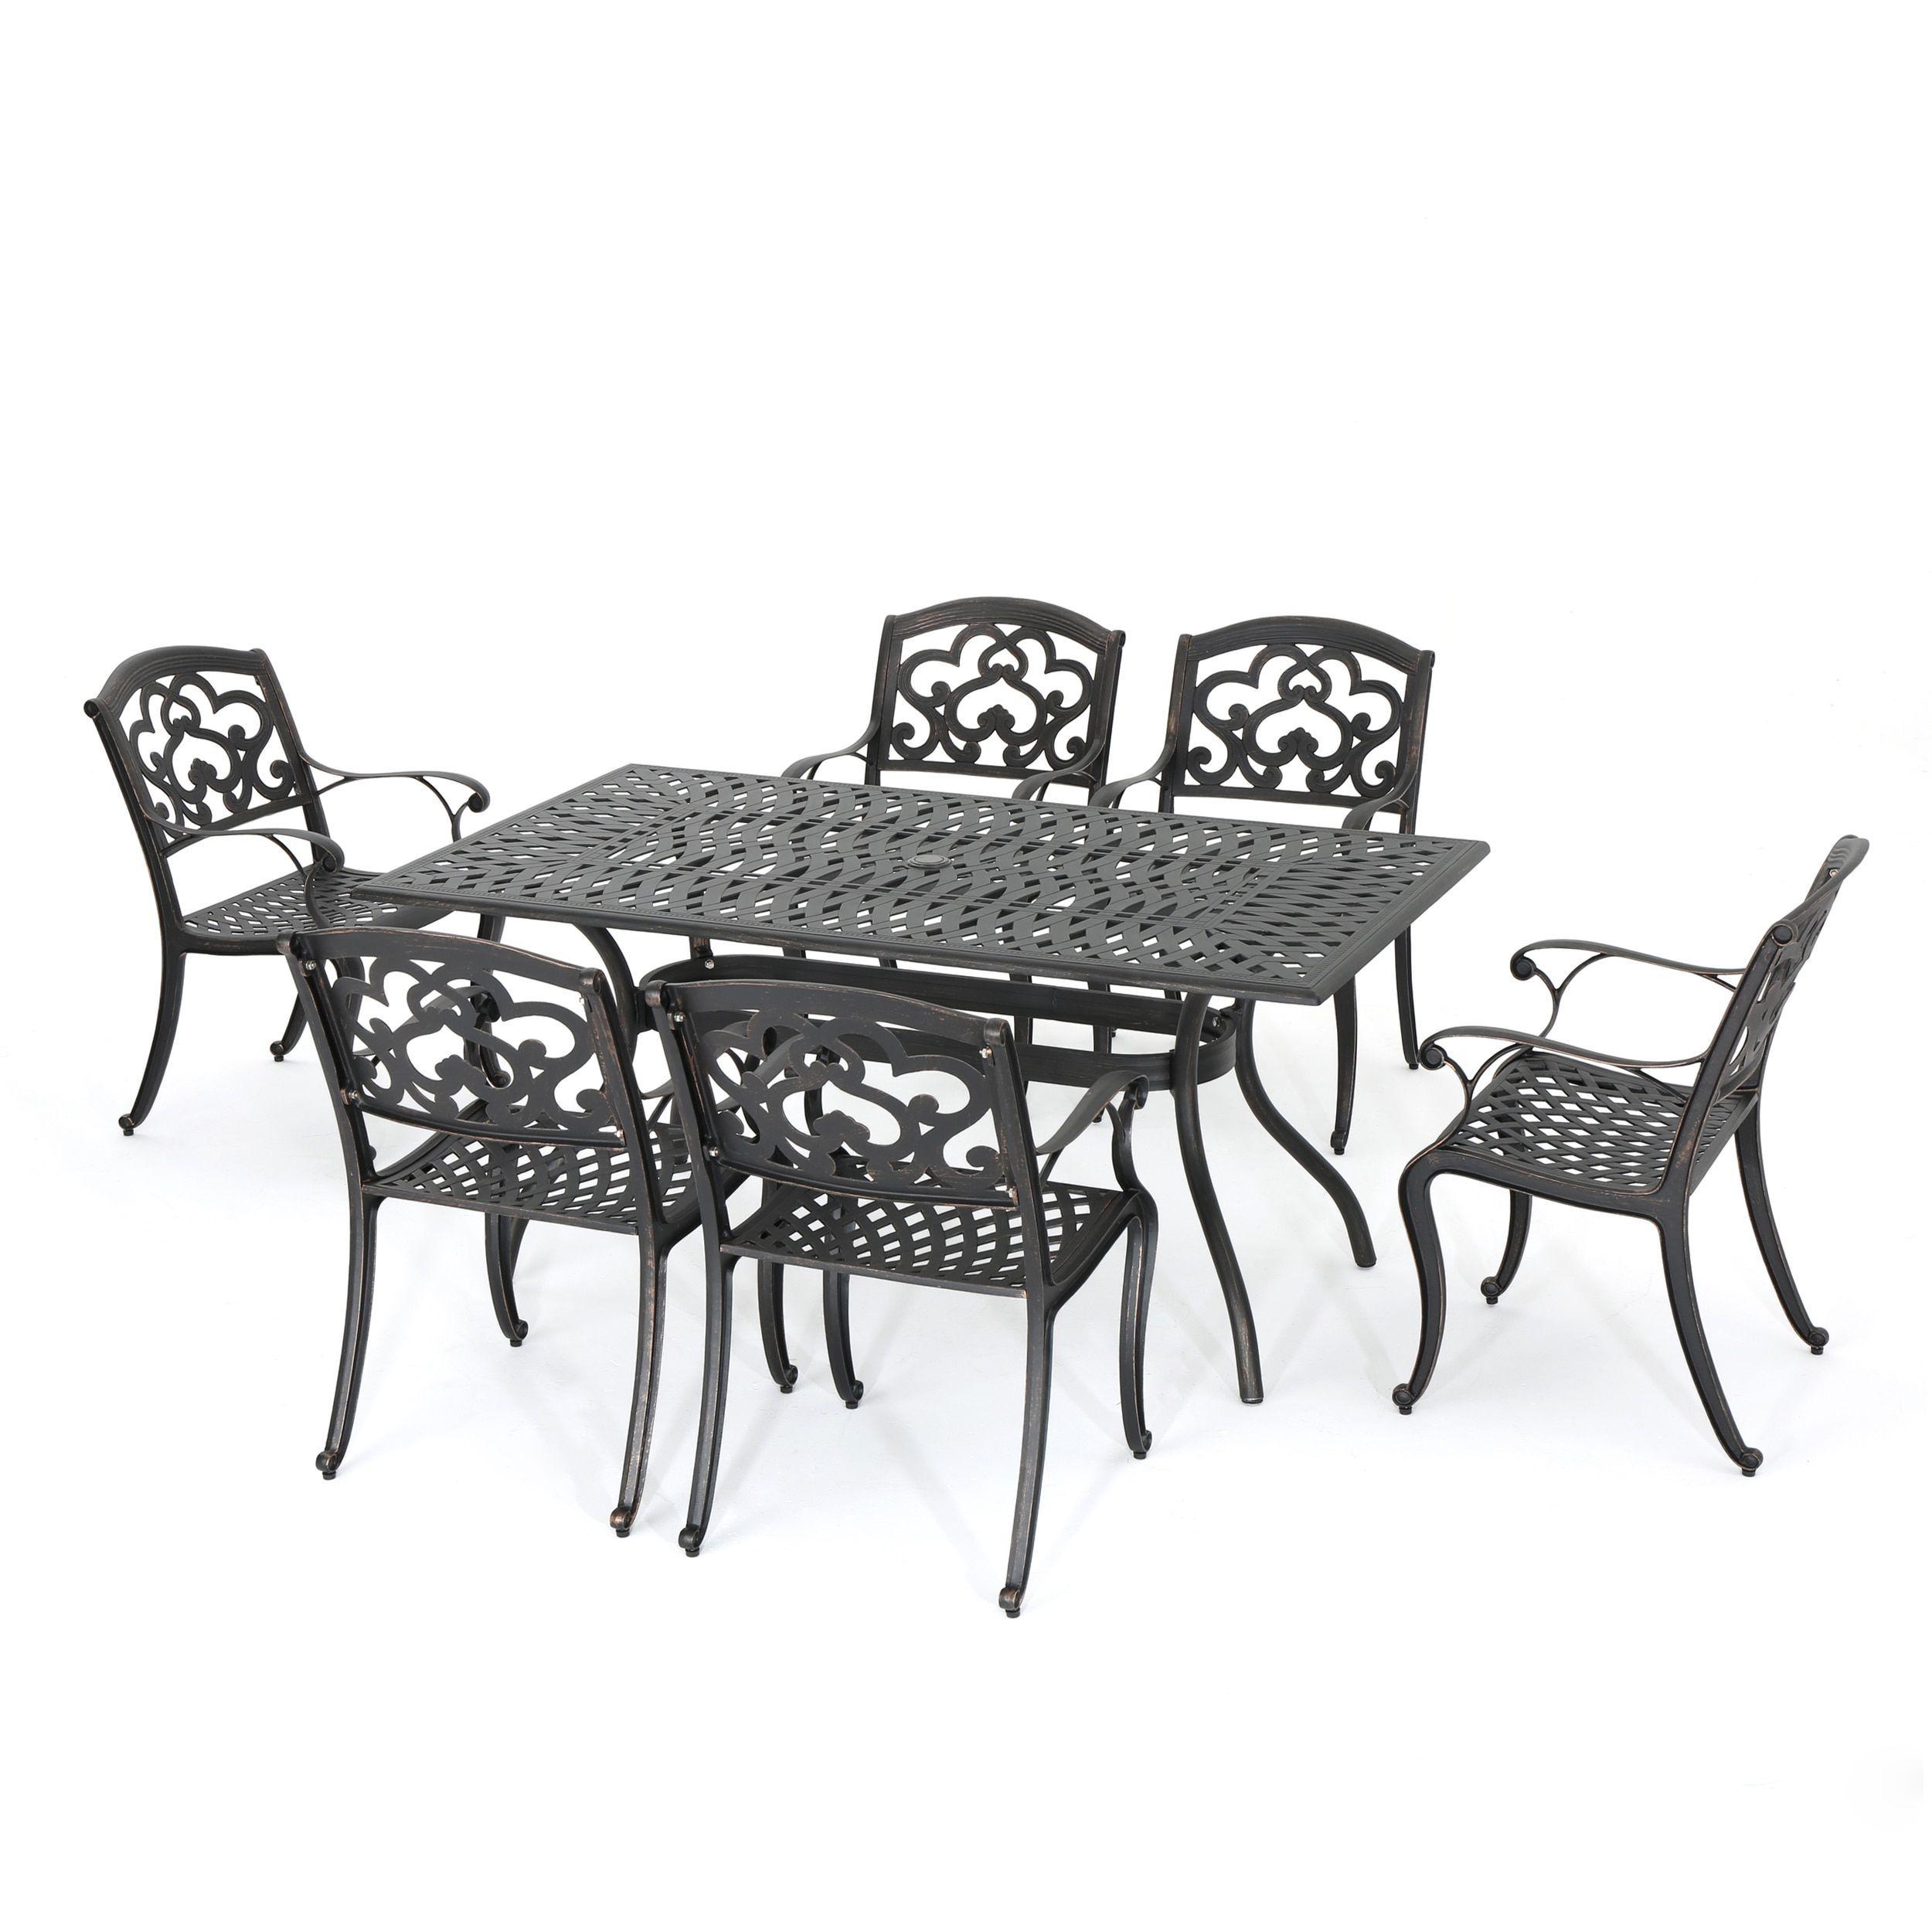 Austin Outdoor 7 Piece Cast Aluminum Rectangle Dining Set By